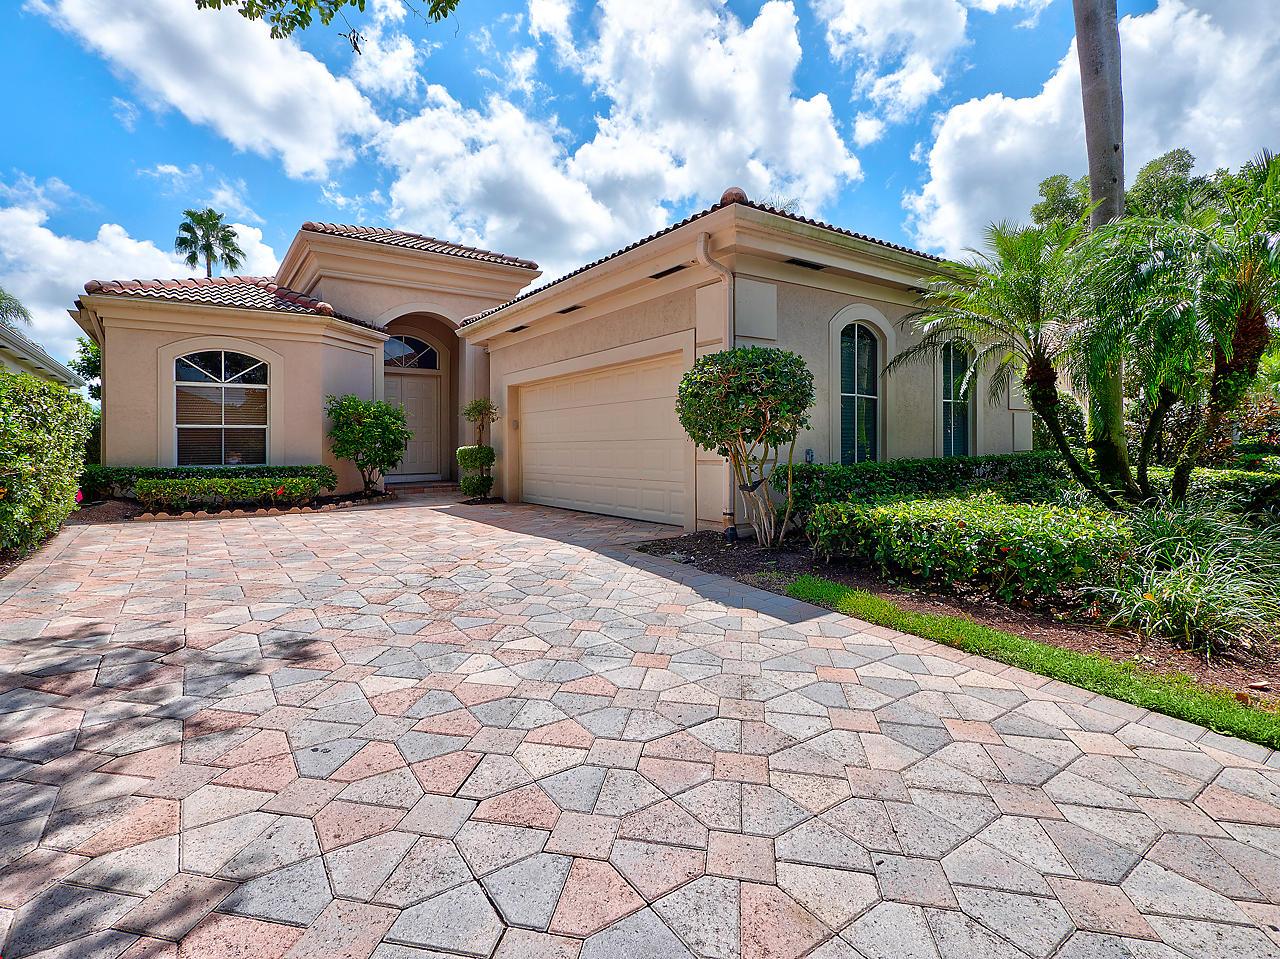 132 Isle Drive Palm Beach Gardens,Florida 33418,3 Bedrooms Bedrooms,3 BathroomsBathrooms,A,Isle,RX-10464916